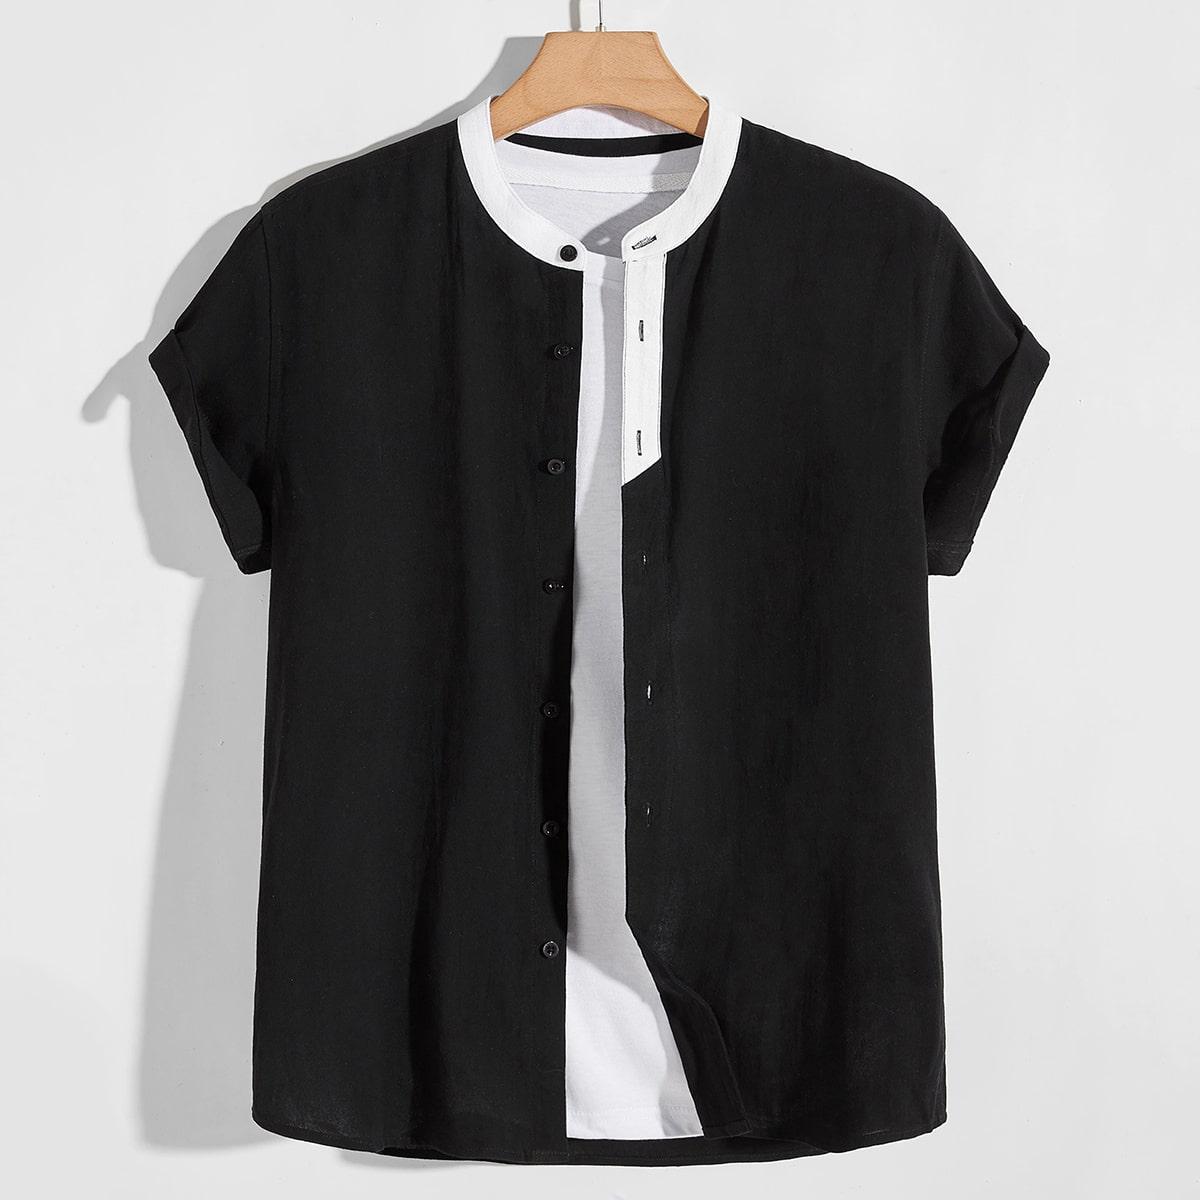 Мужская рубашка на пуговицах без футболки